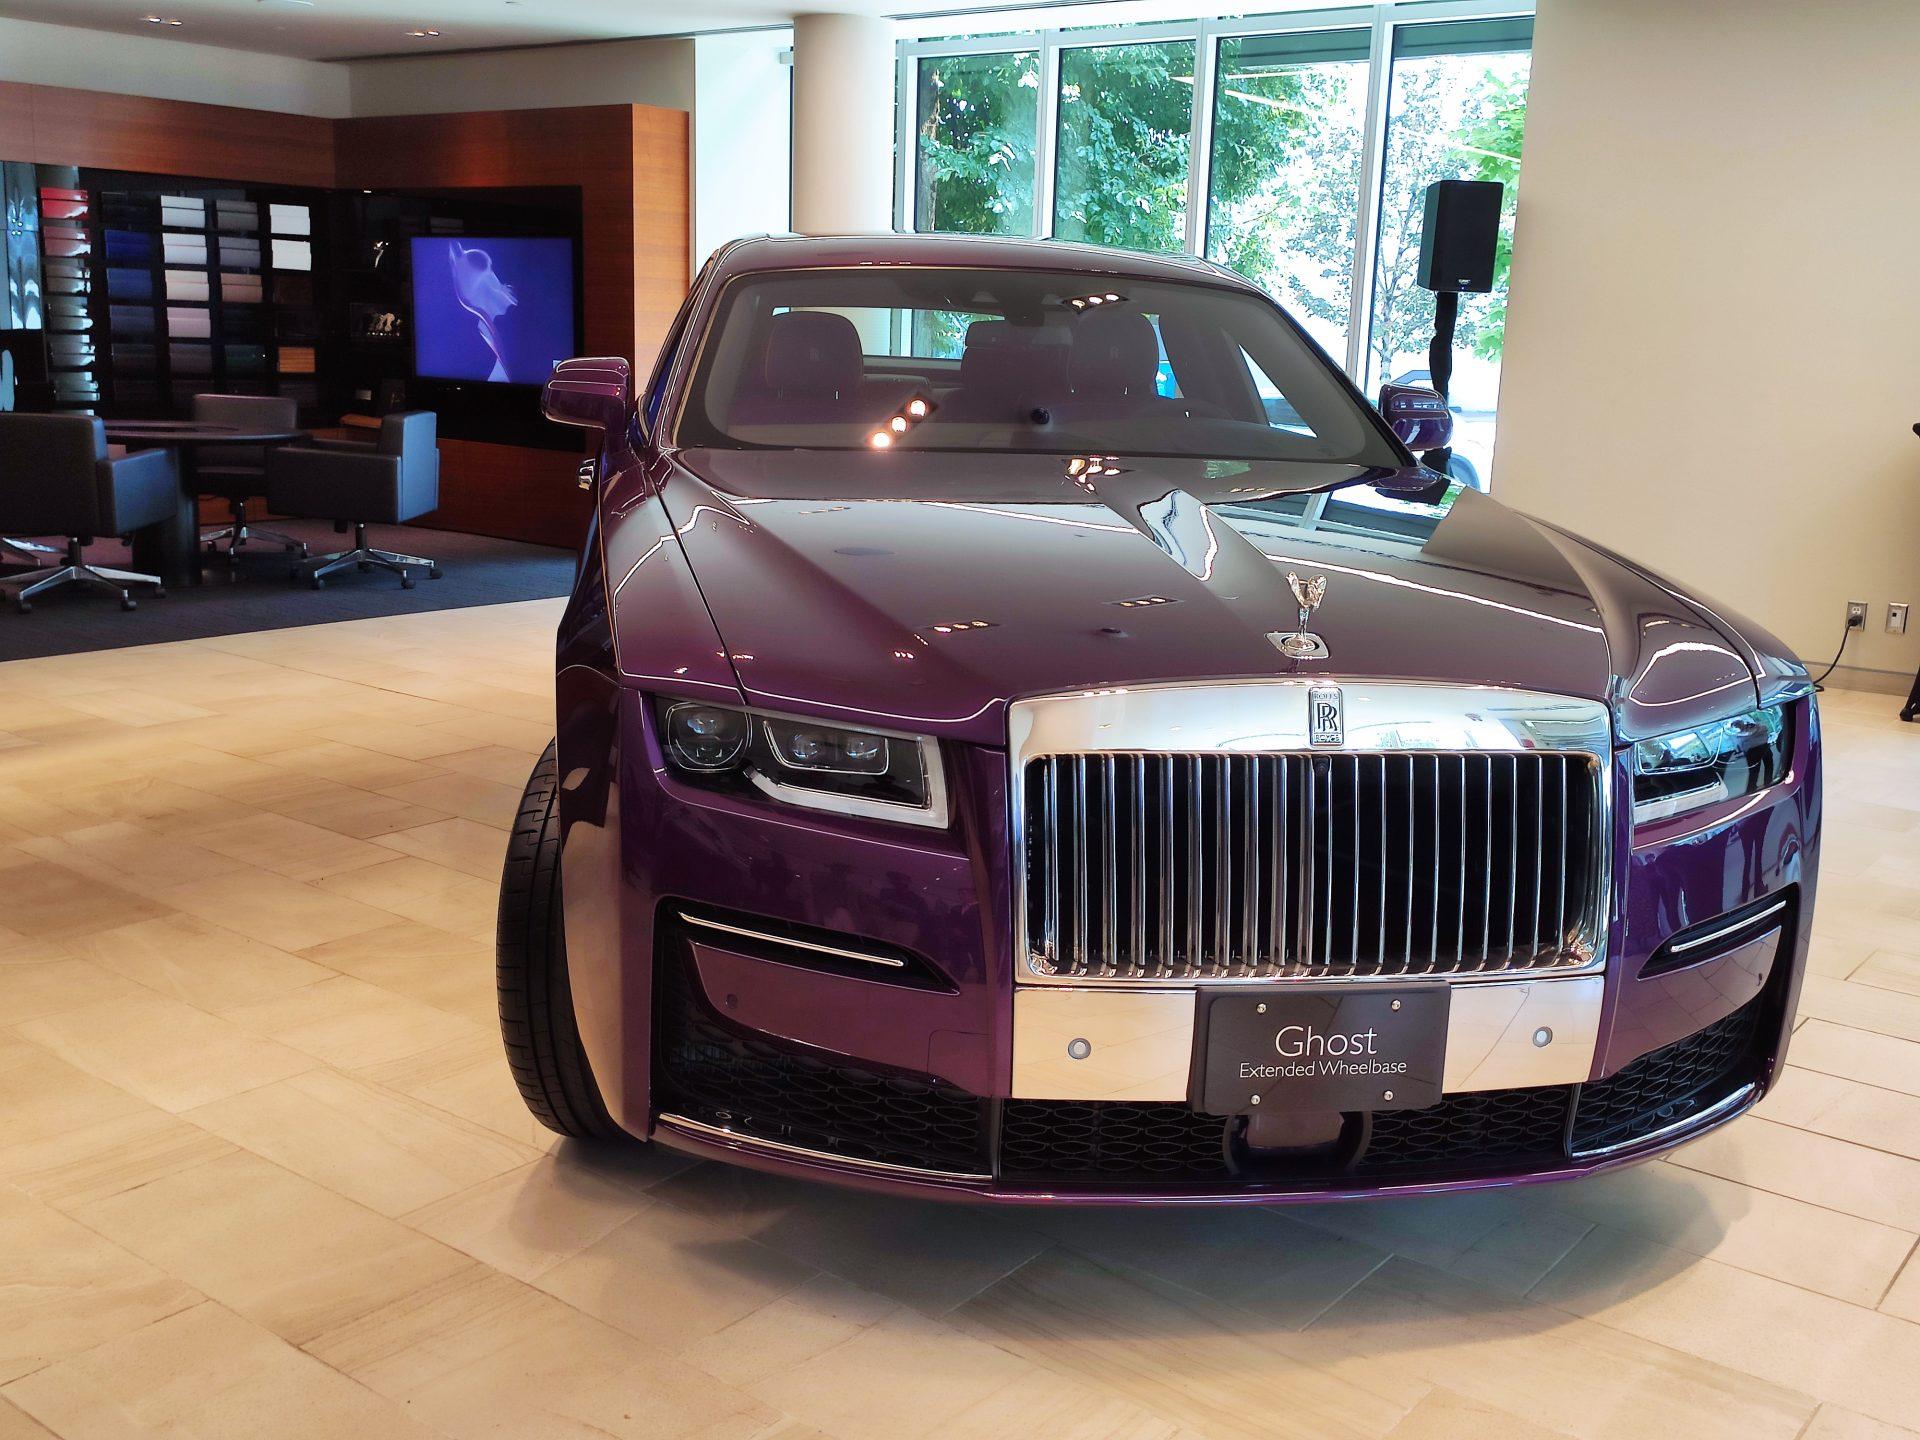 Rolls-Royce unveiled